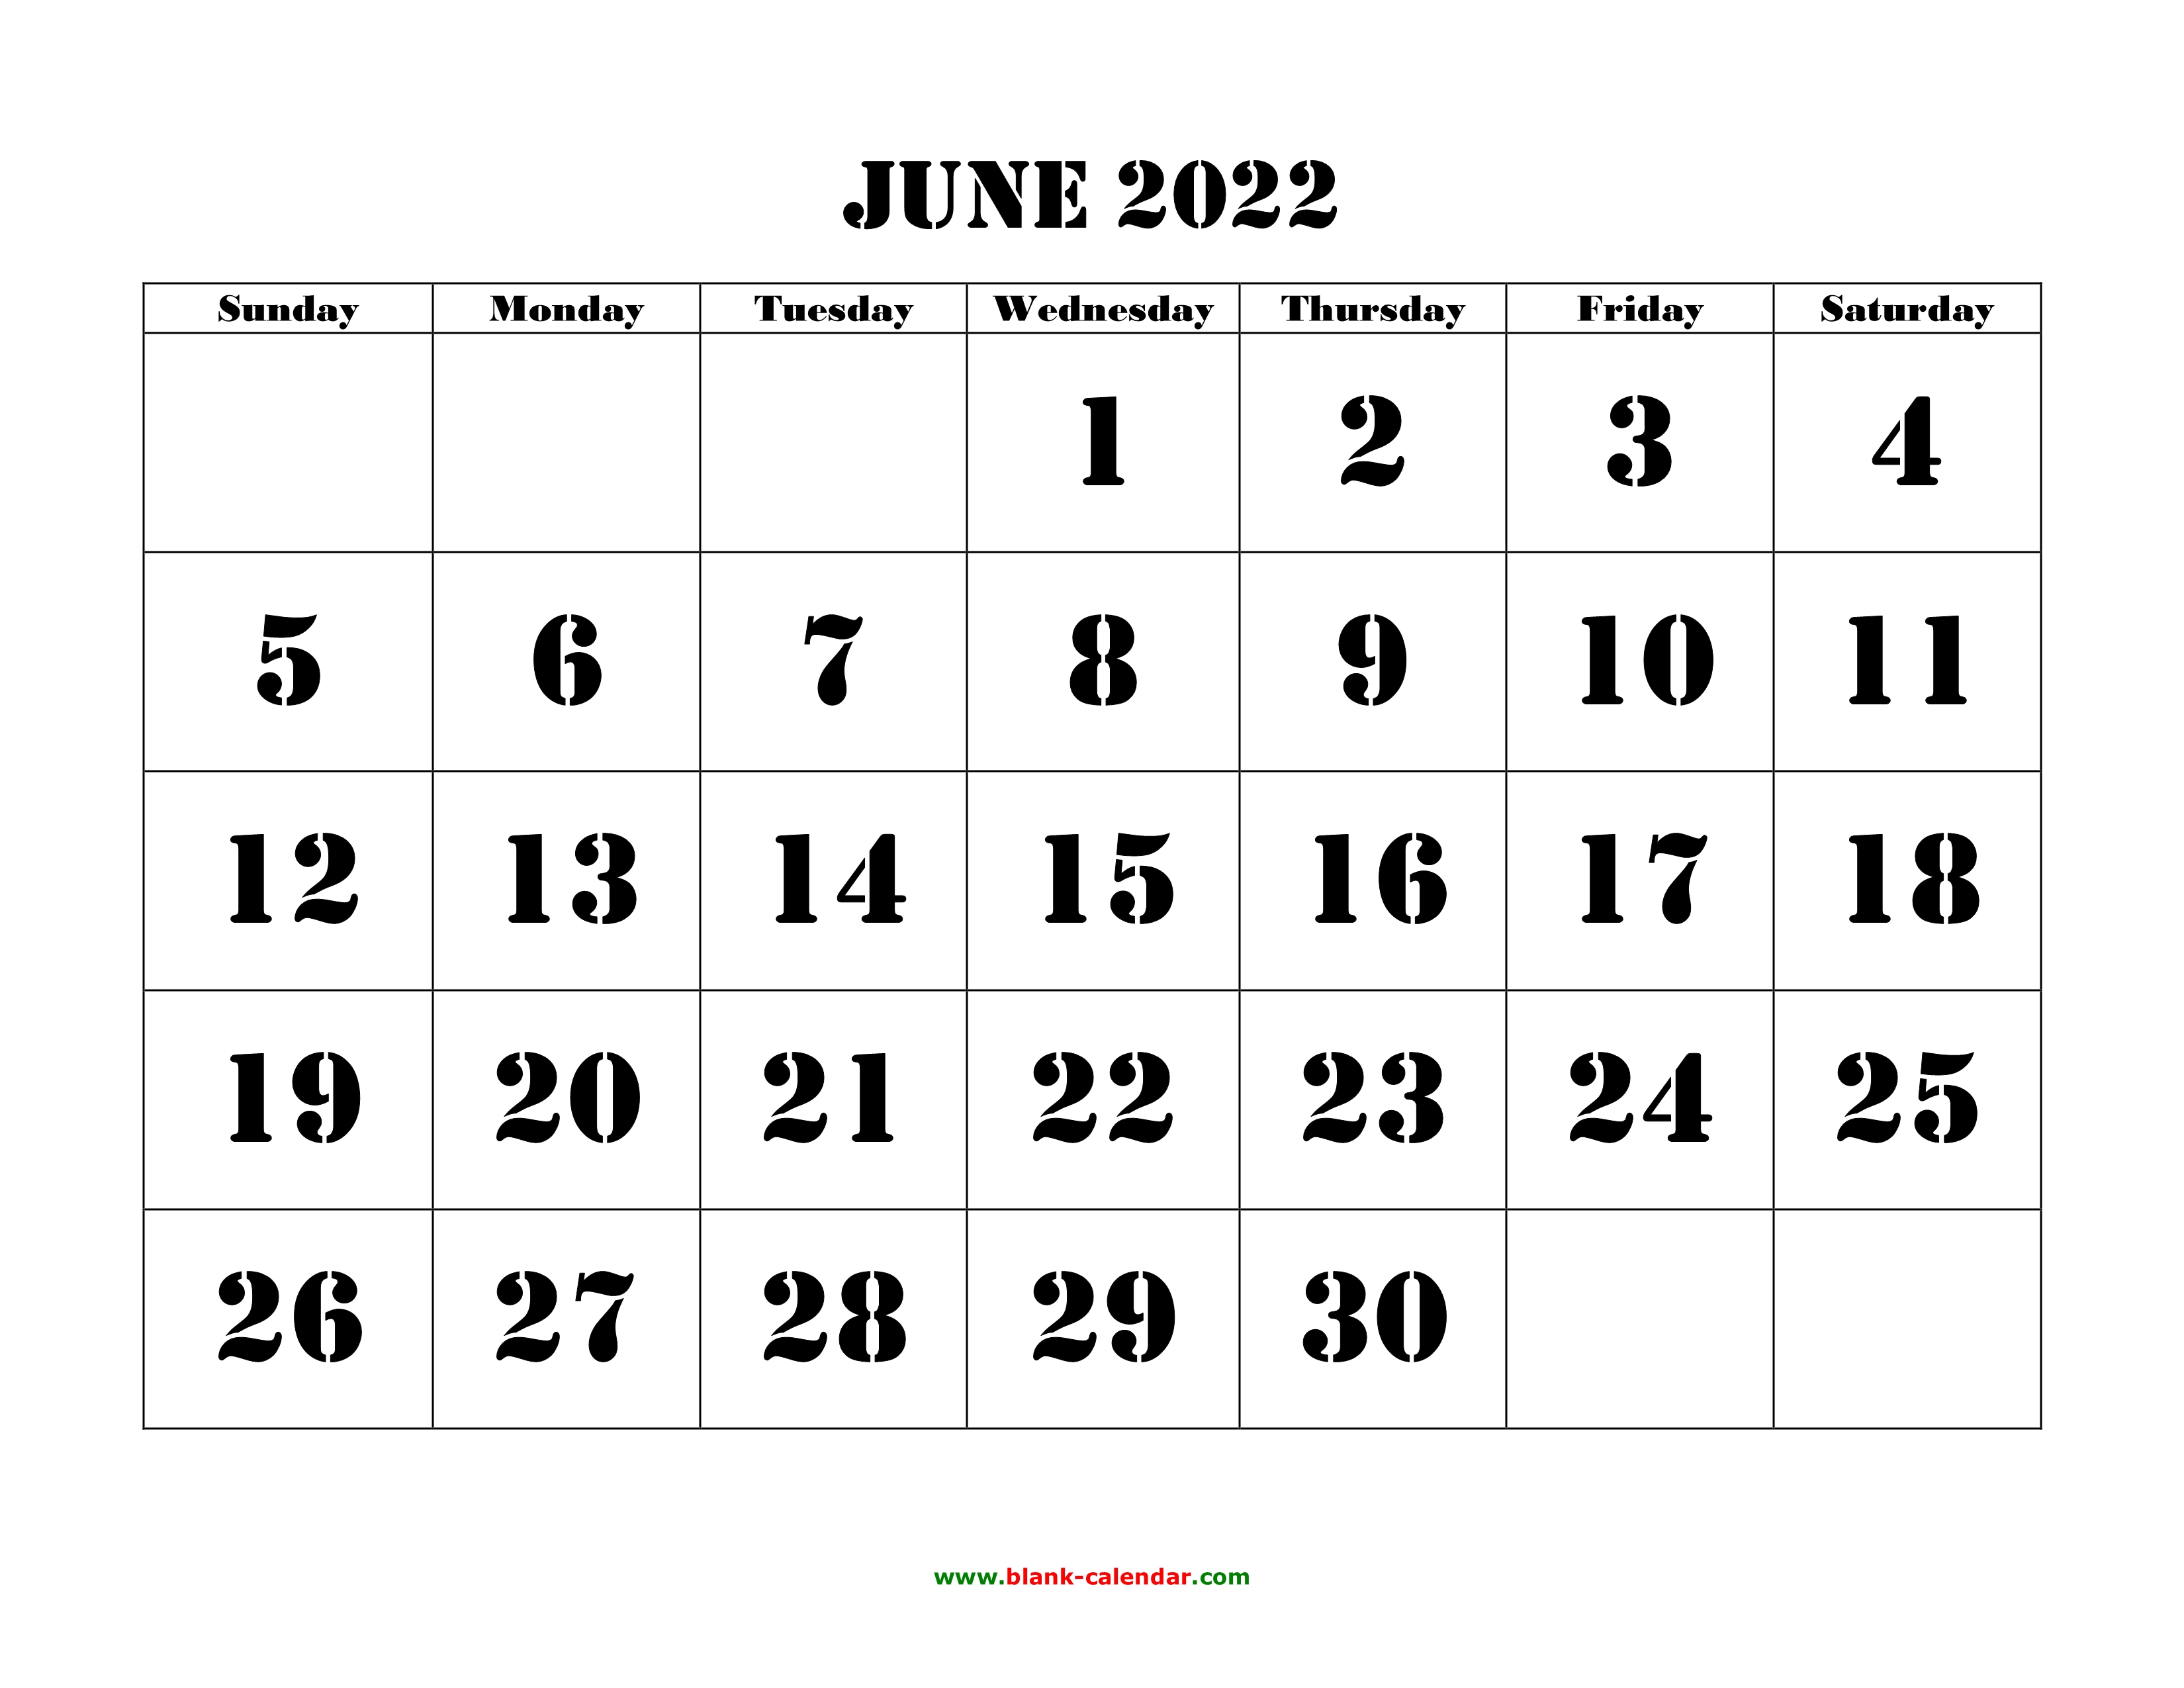 Blank Calendar For June 2022.June 2022 Printable Calendar Free Download Monthly Calendar Templates